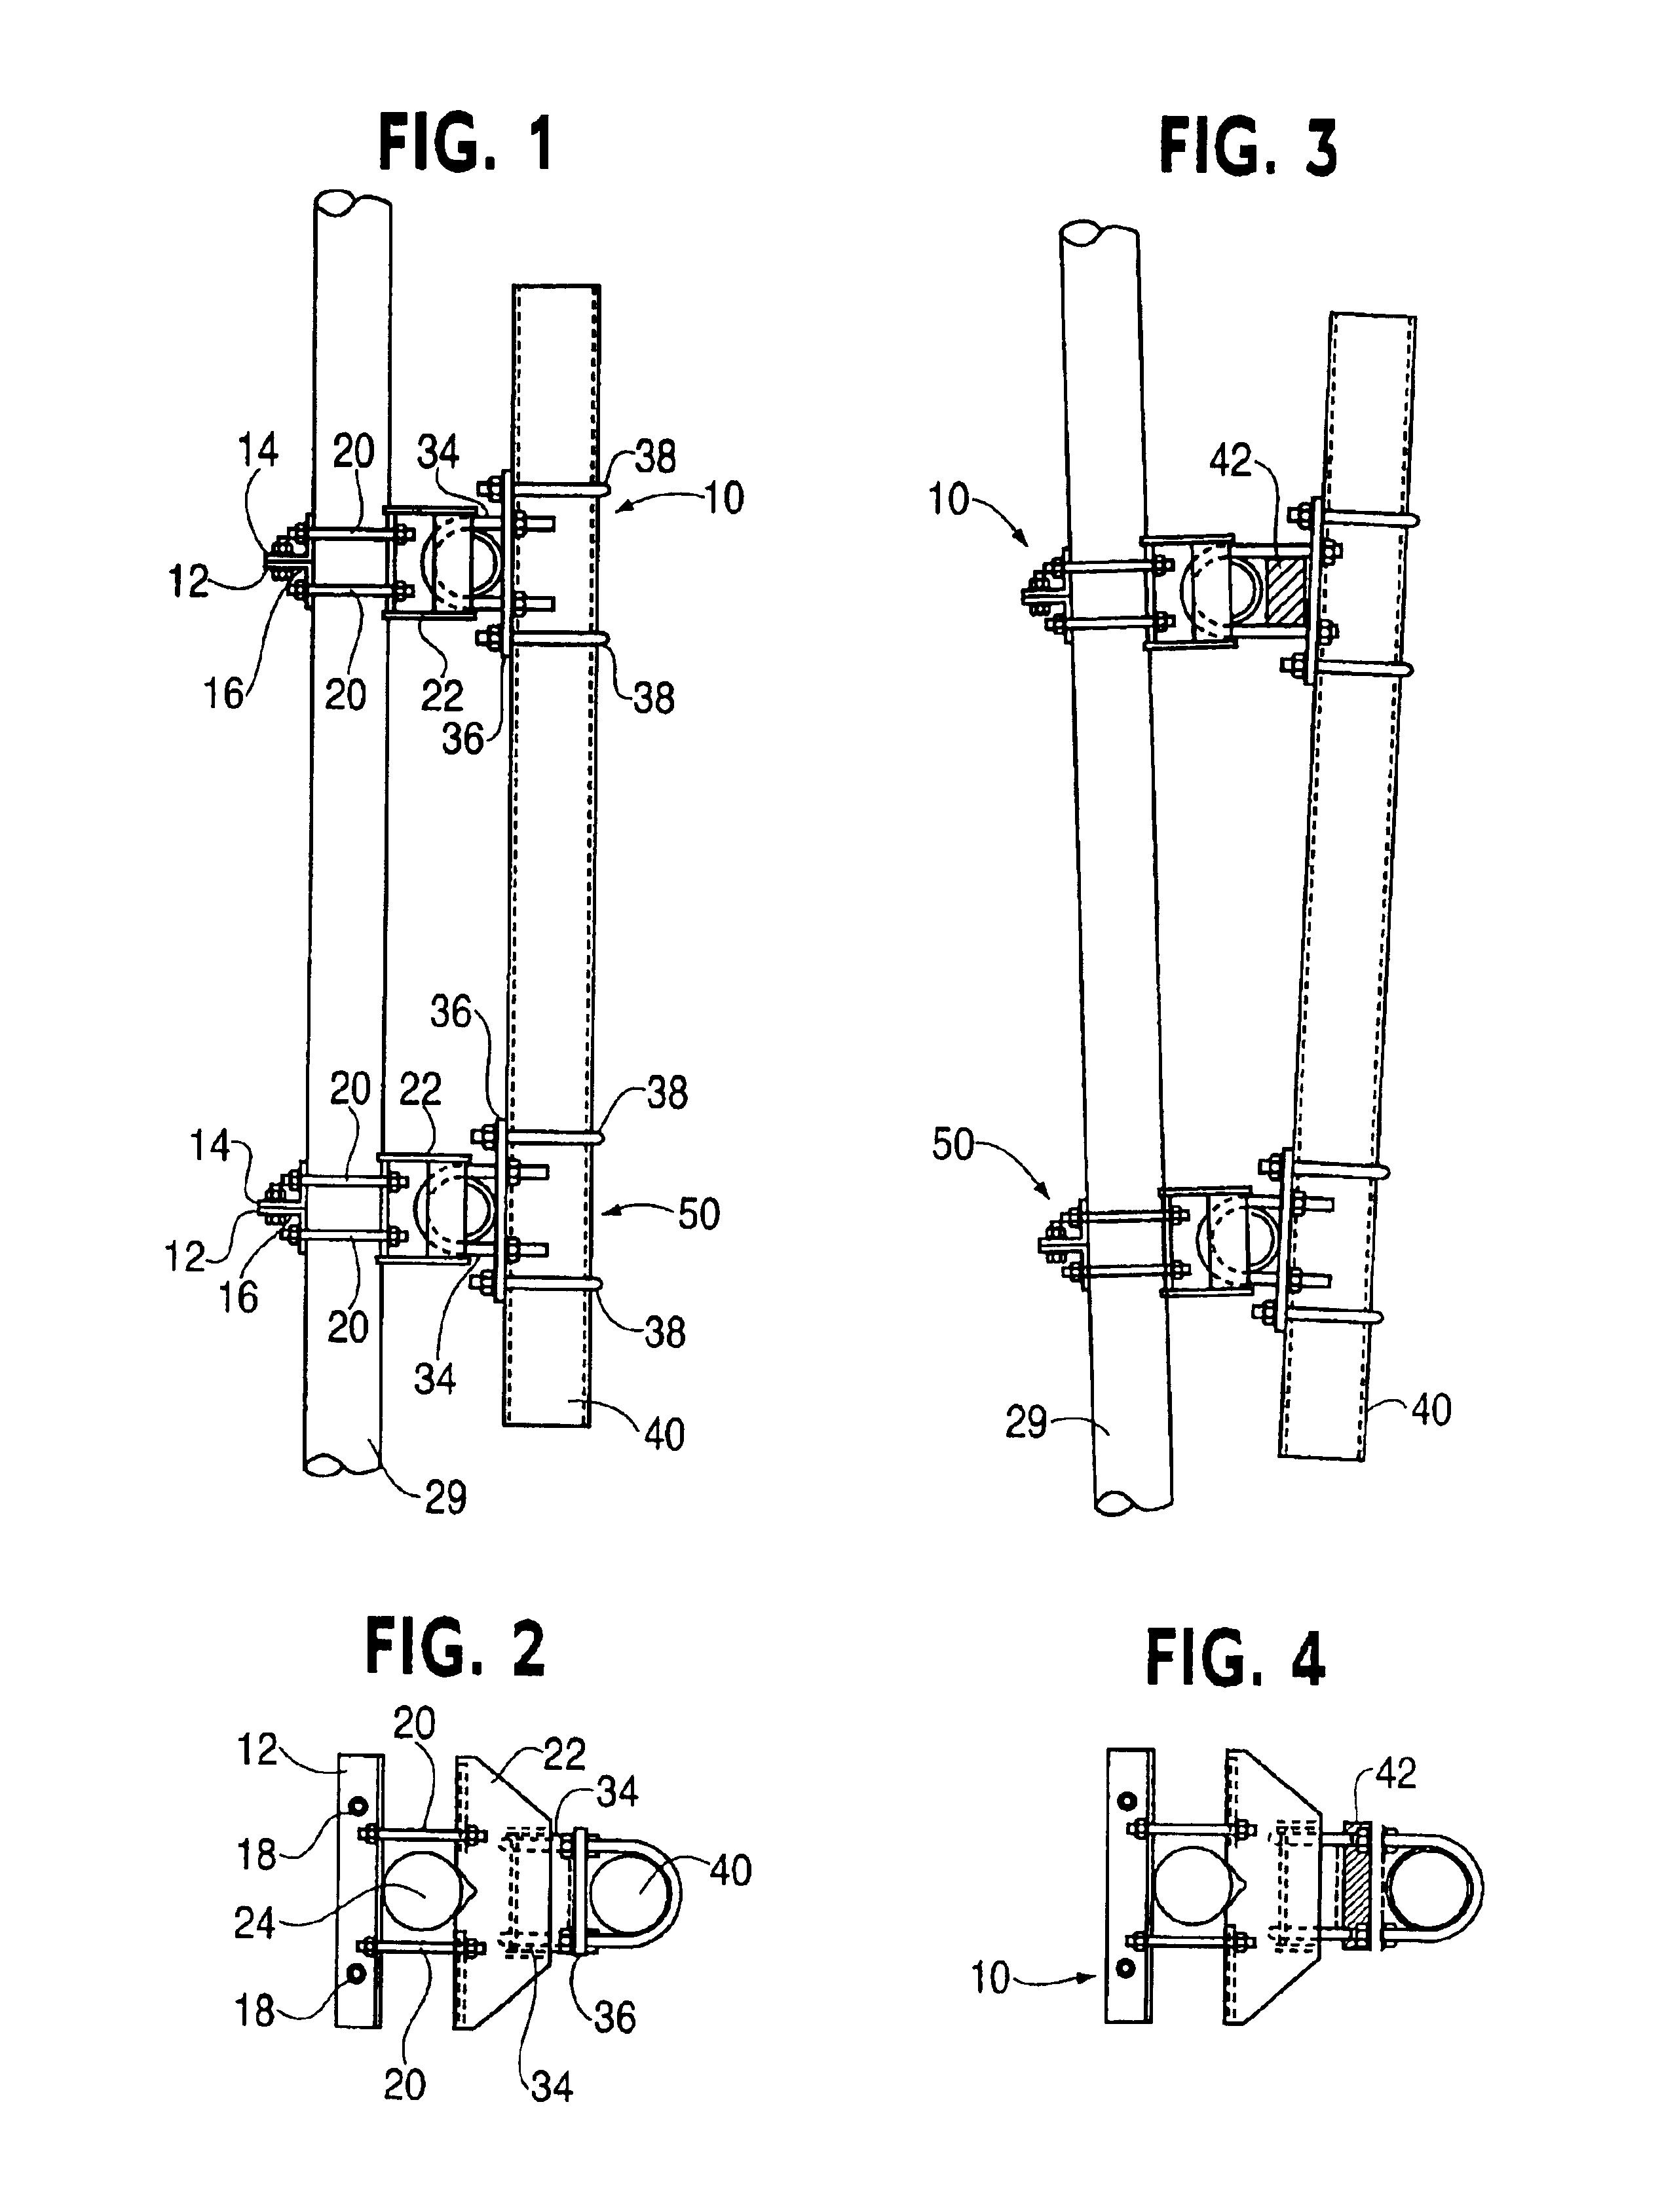 Patent US 6,768,474 B2